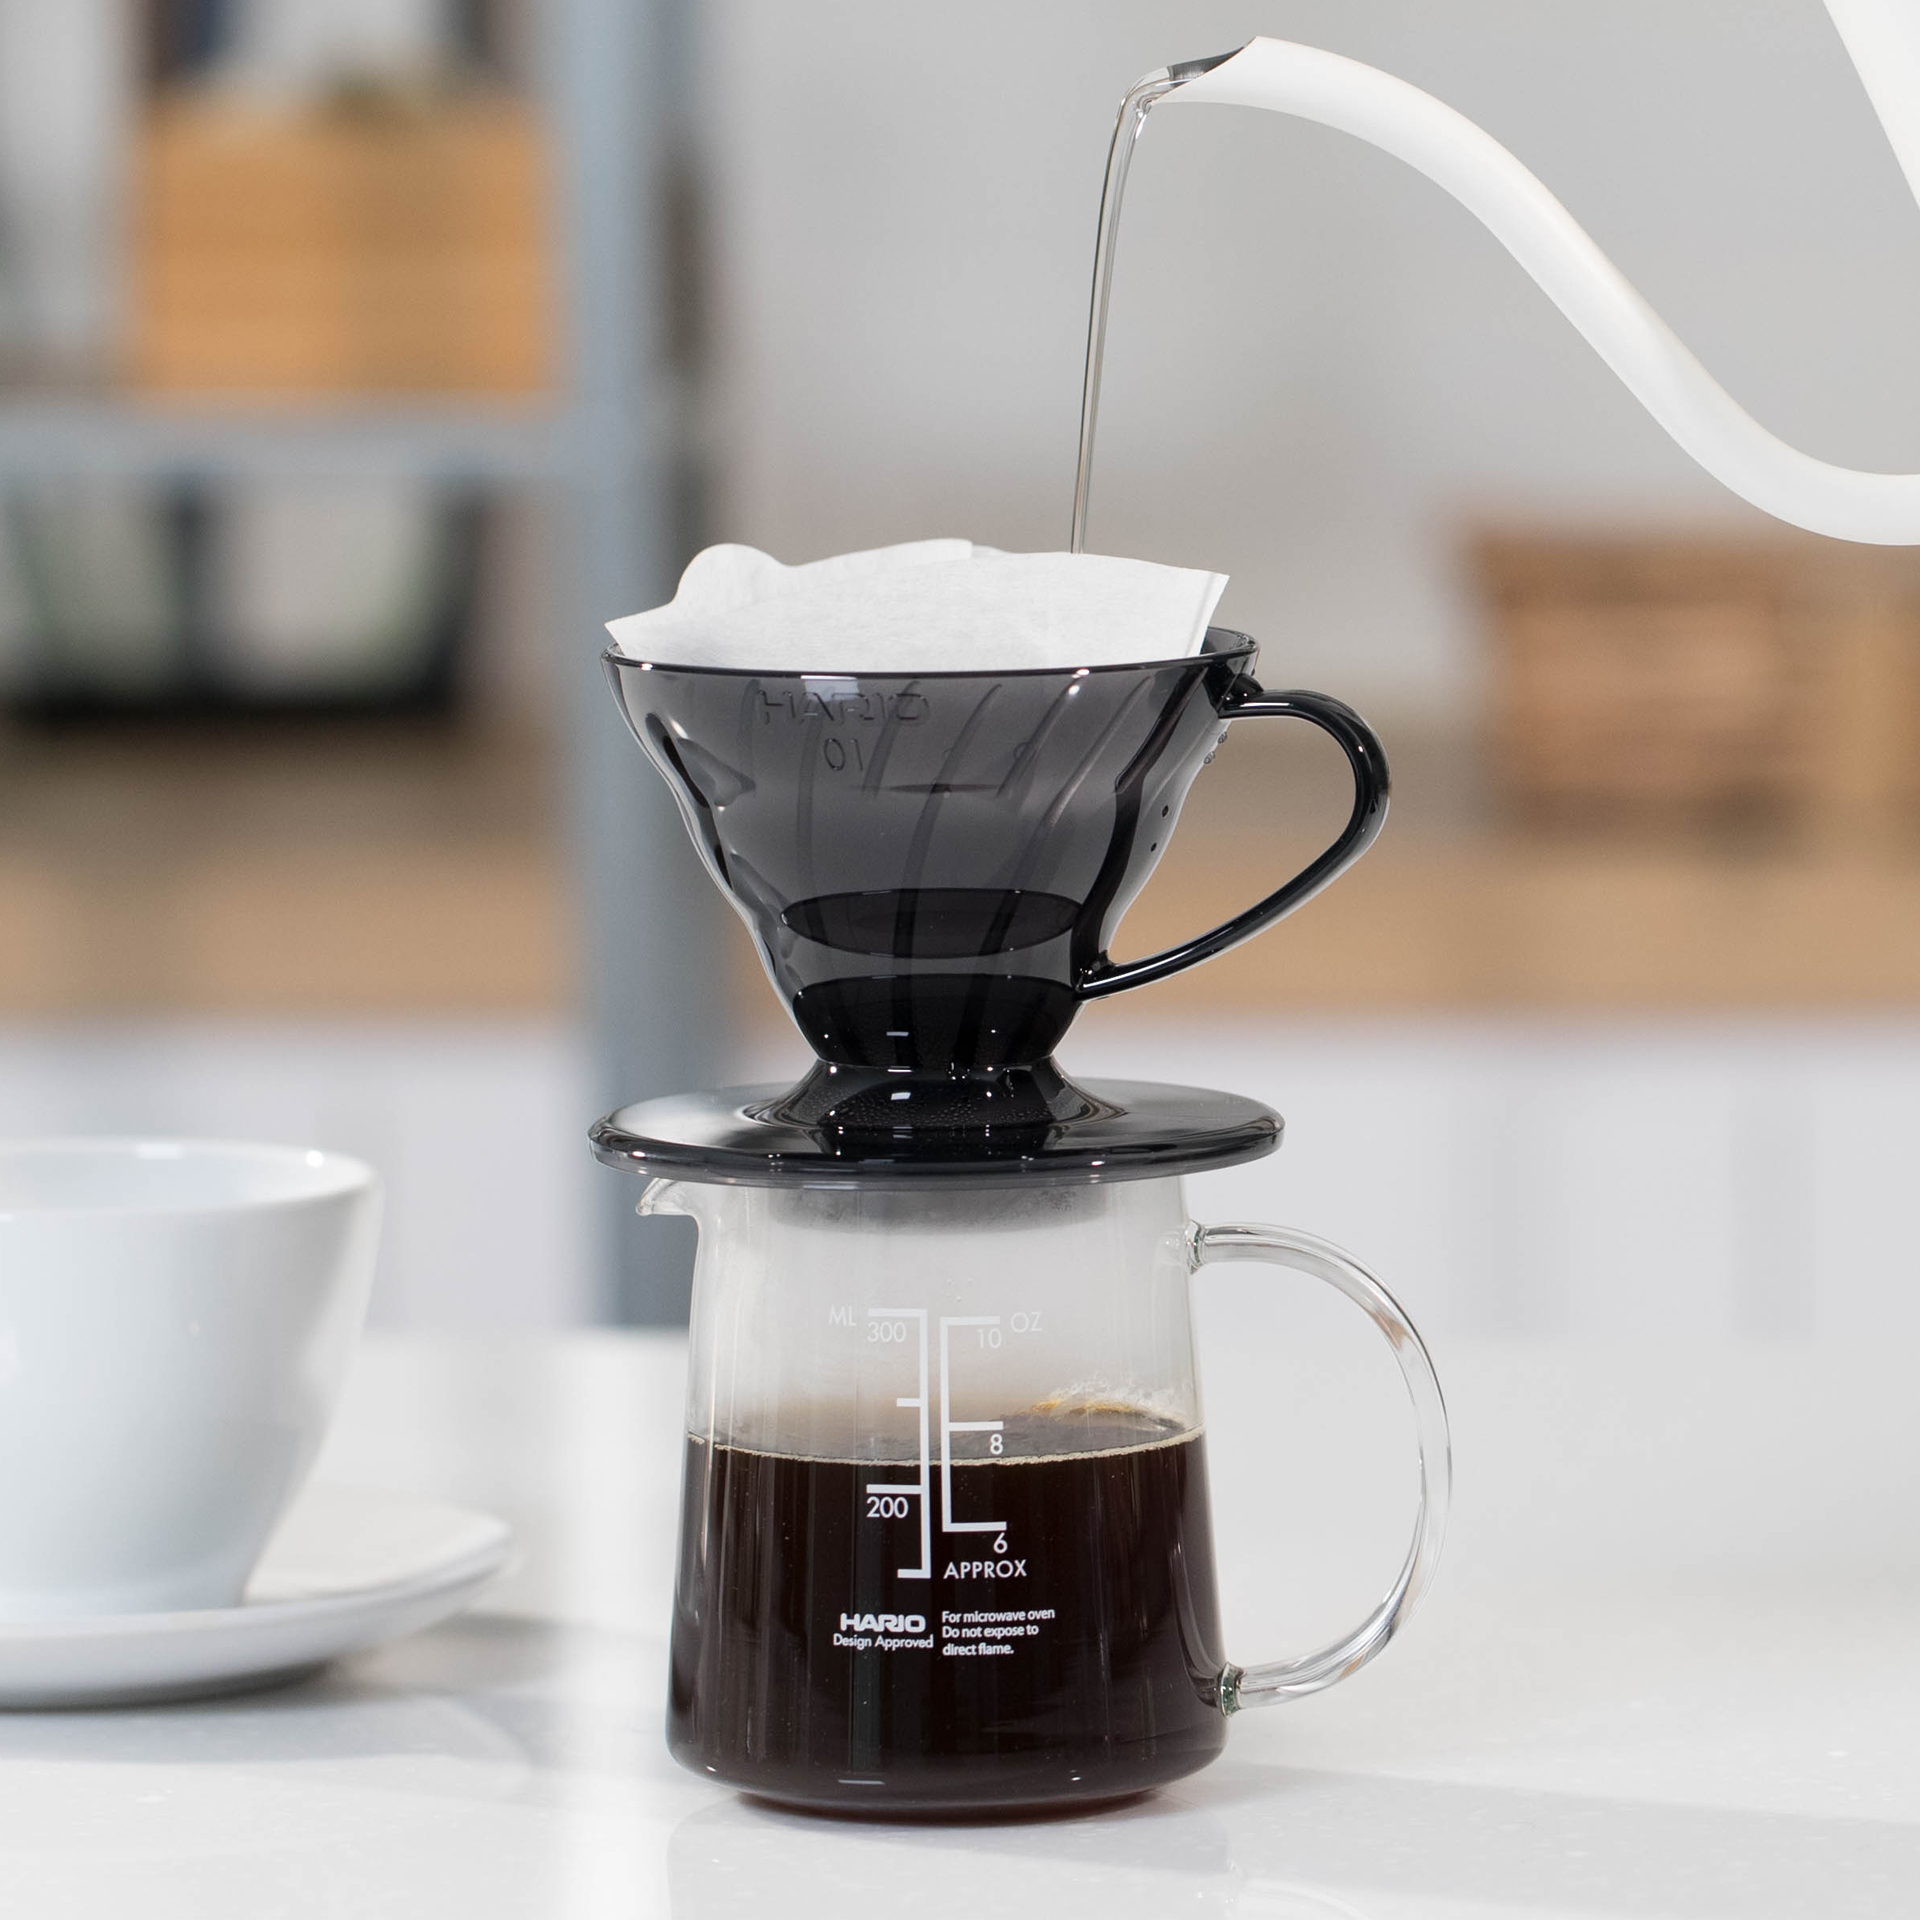 【贈品】HARIO V60 濾杯咖啡壺組